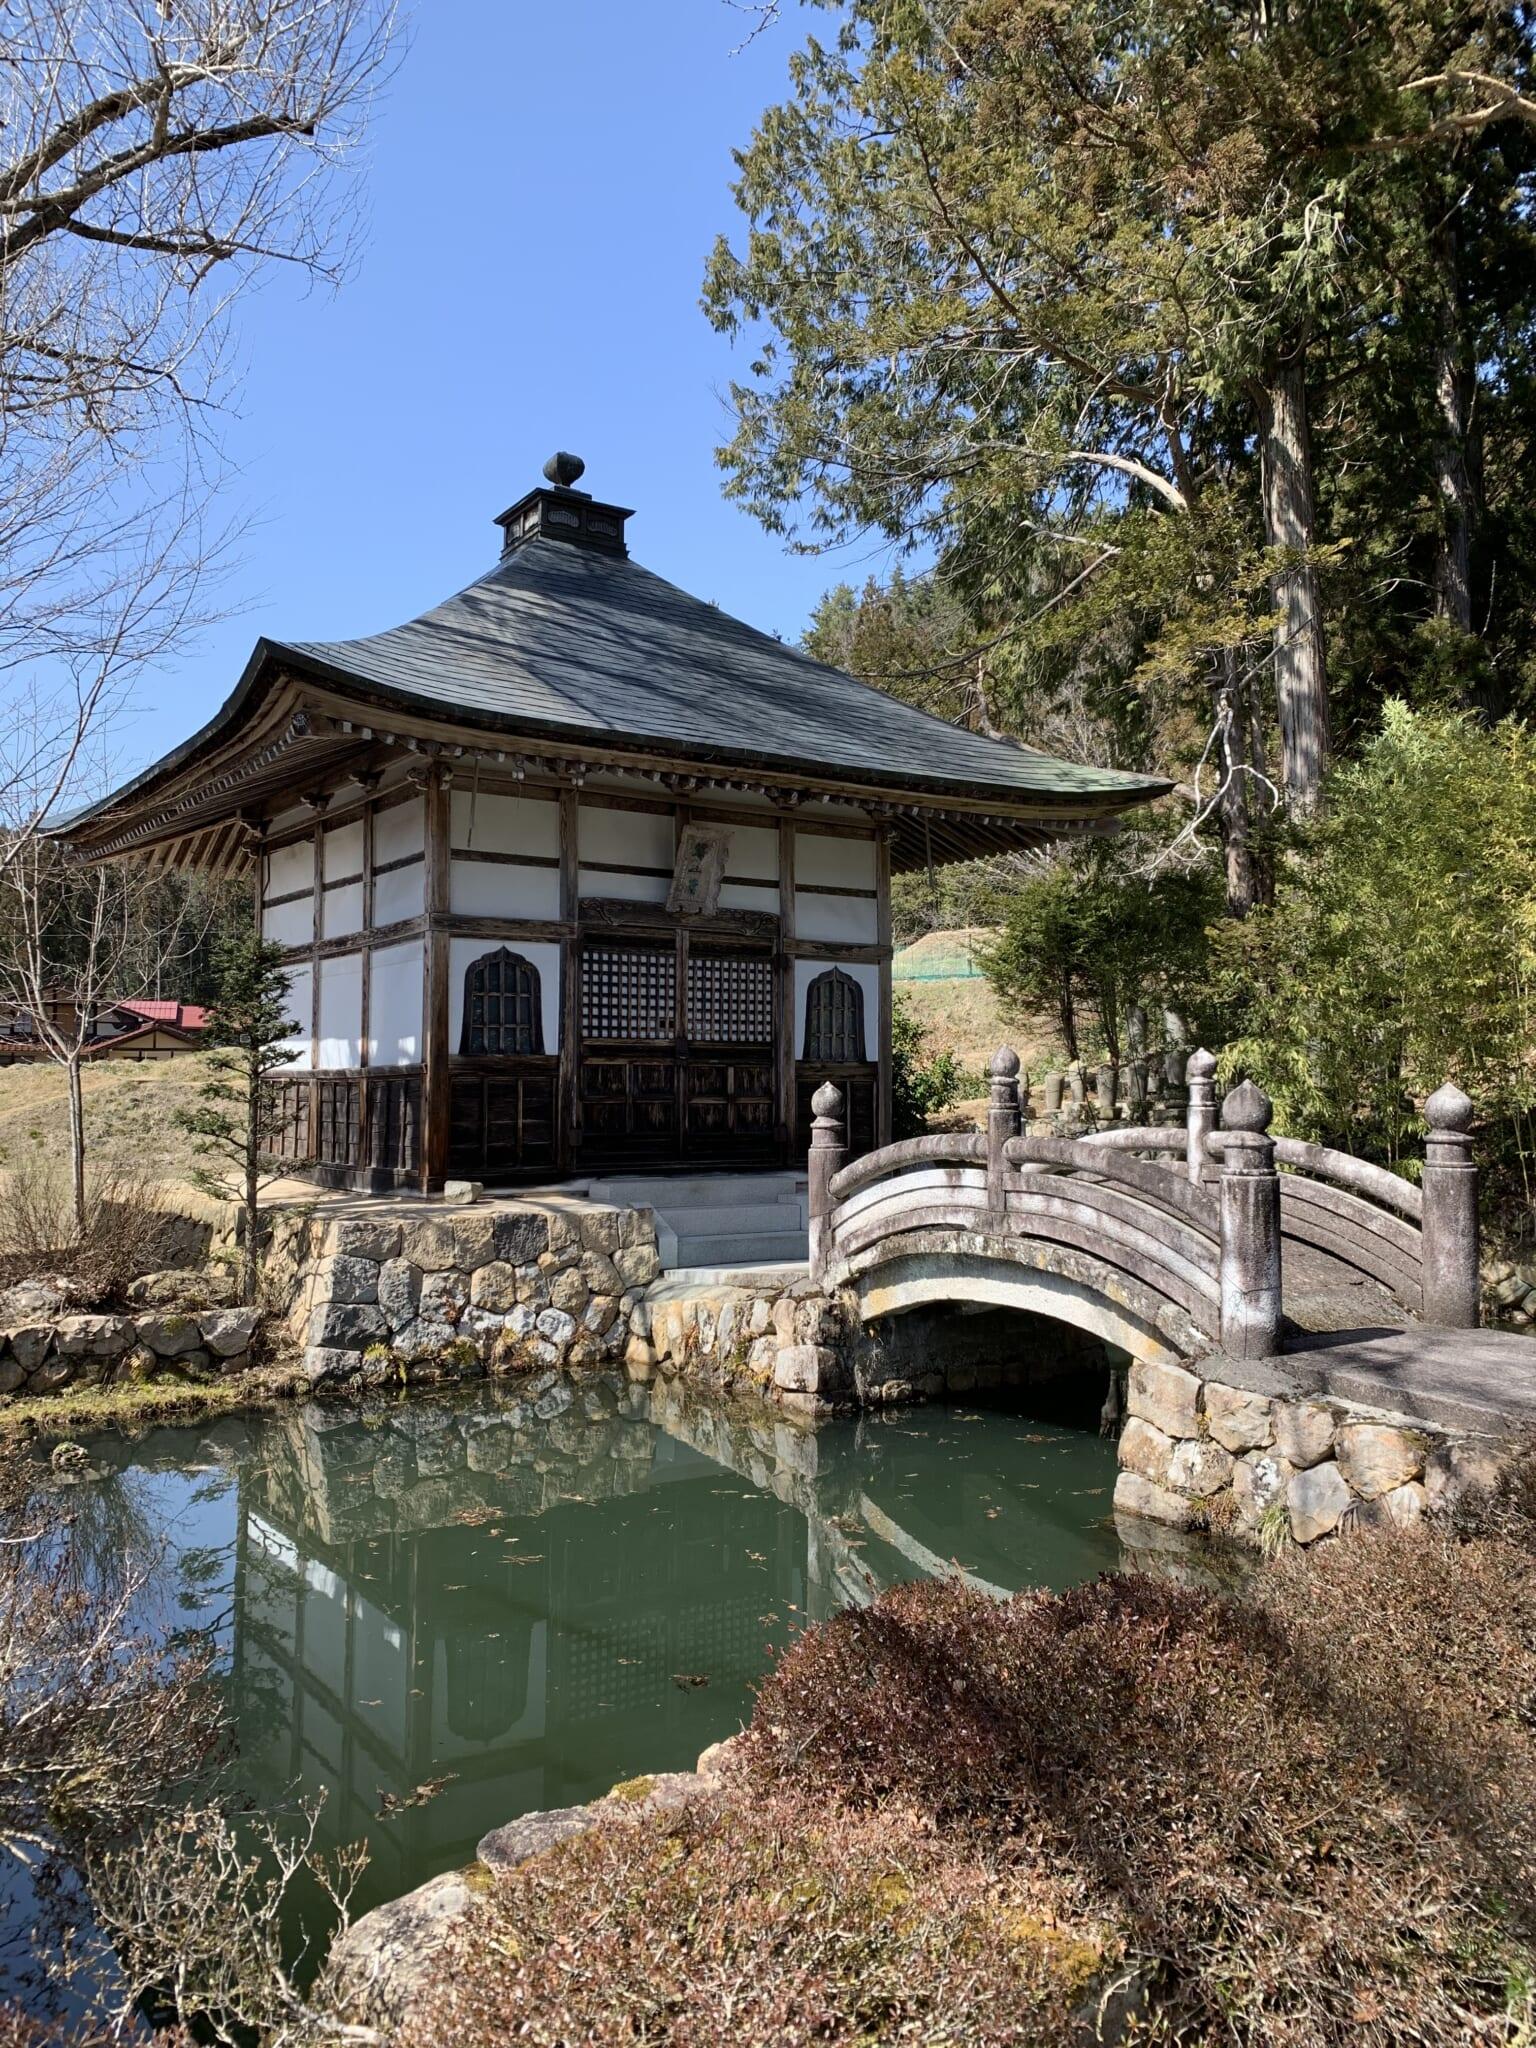 Takayama, an Enduring Landscape of Authentic Japan